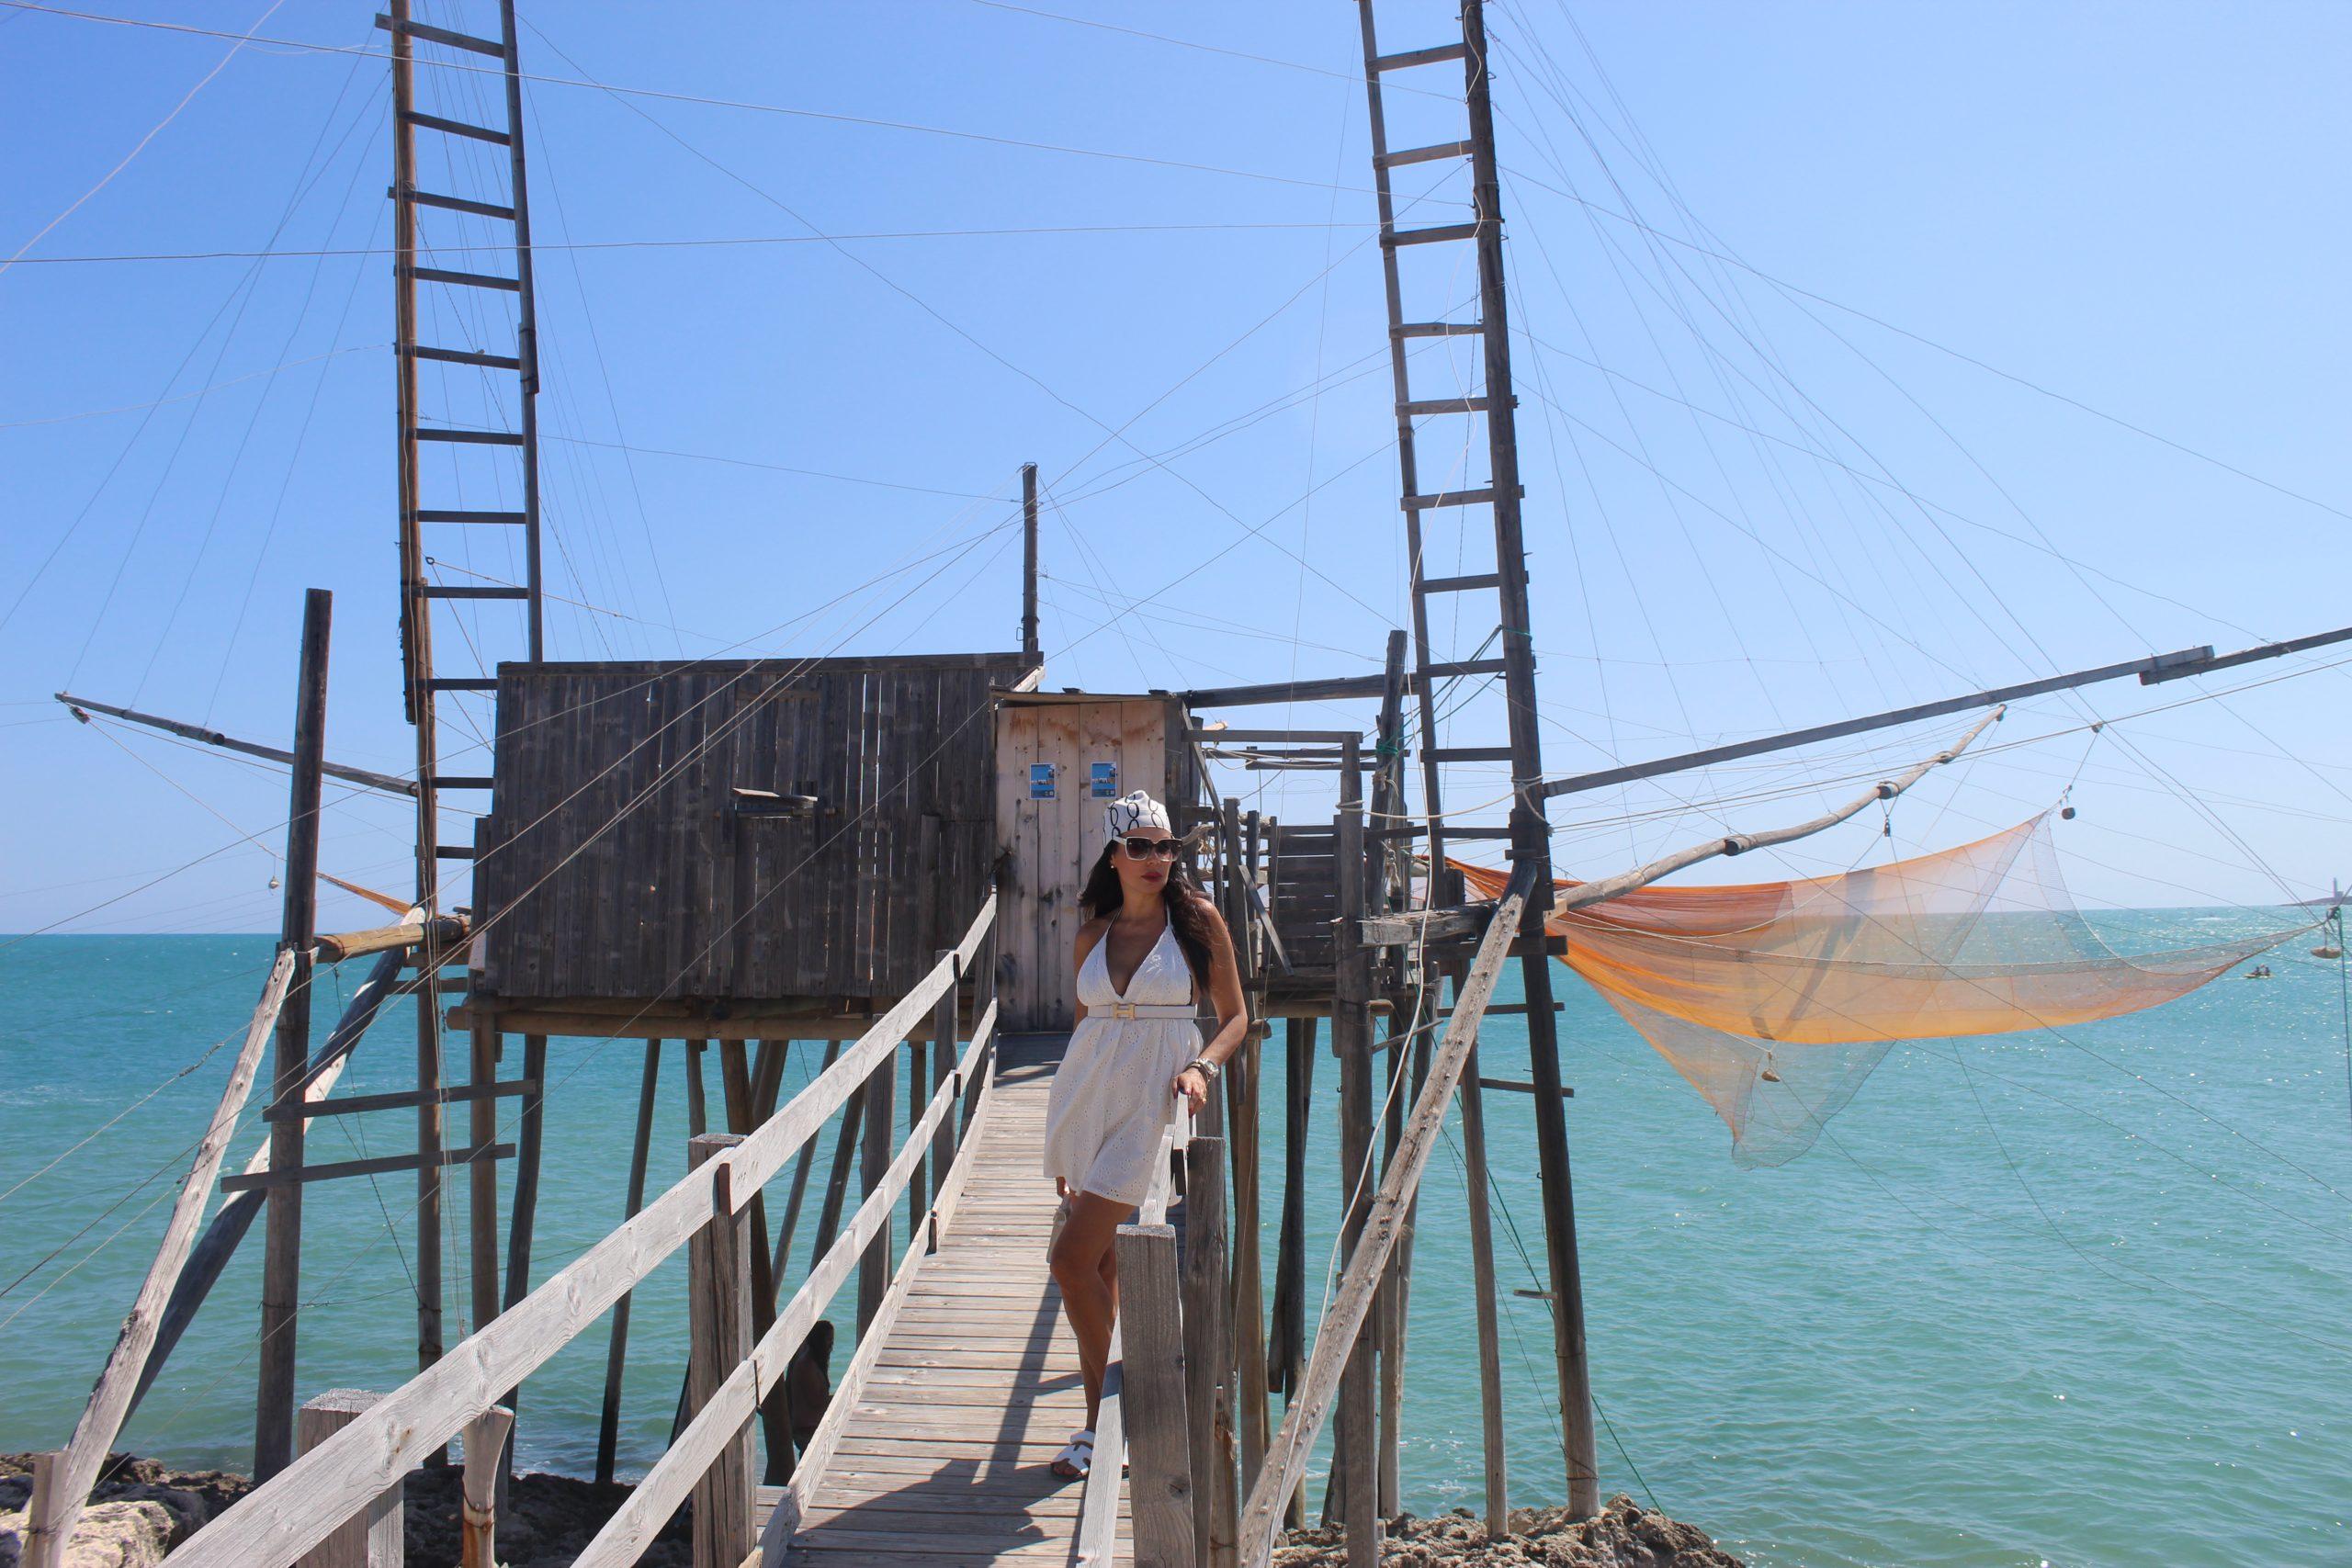 Trabocchi Gargano Italian Summer Staycation Hermes Elisabetta Franchi Lookbook Paola Lauretano